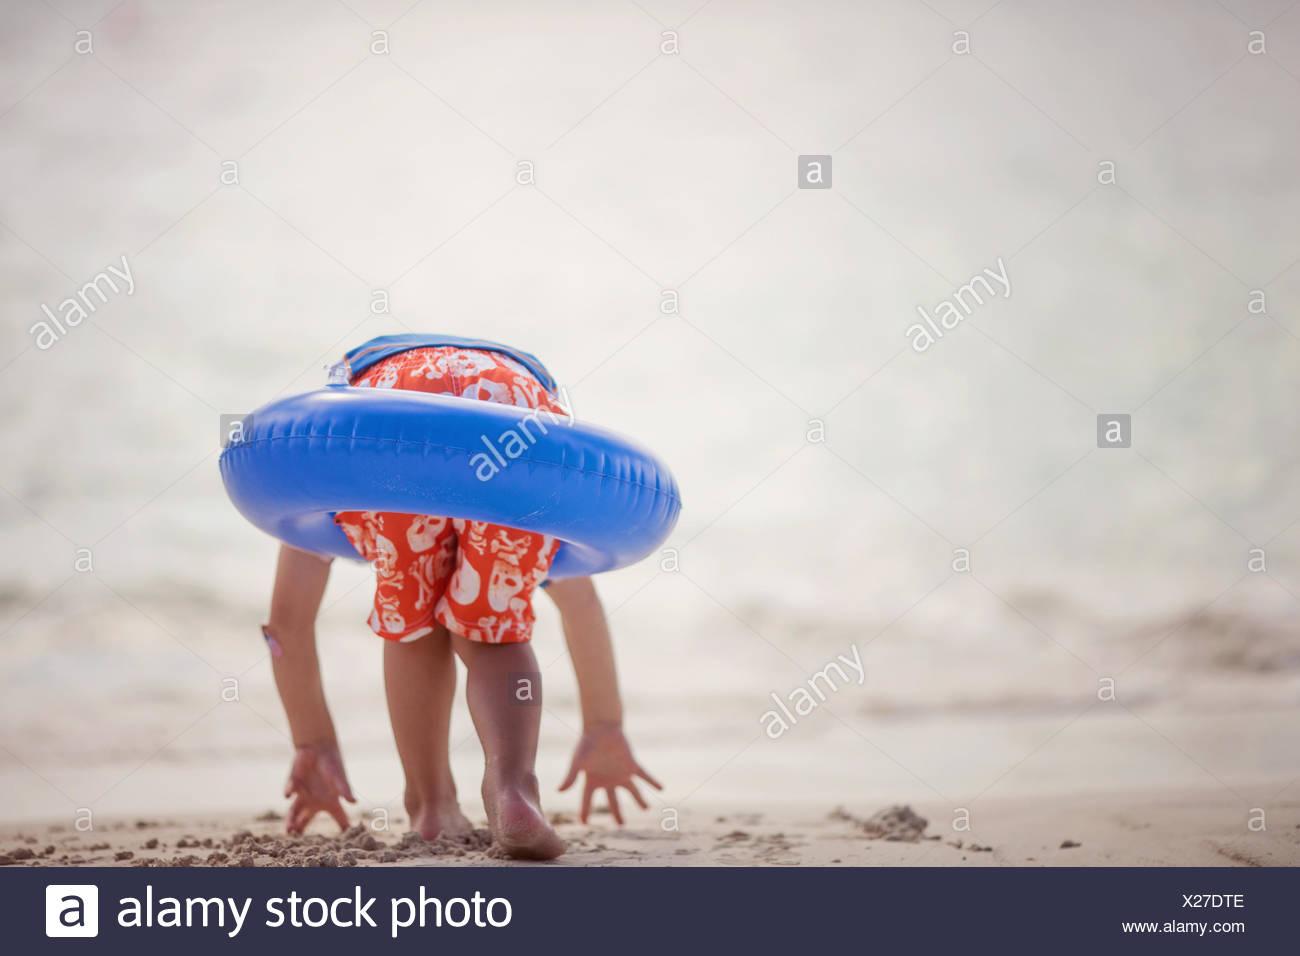 Jungen tragen einen Gummiring am Strand, Playa del Carmen, Mexiko Stockbild